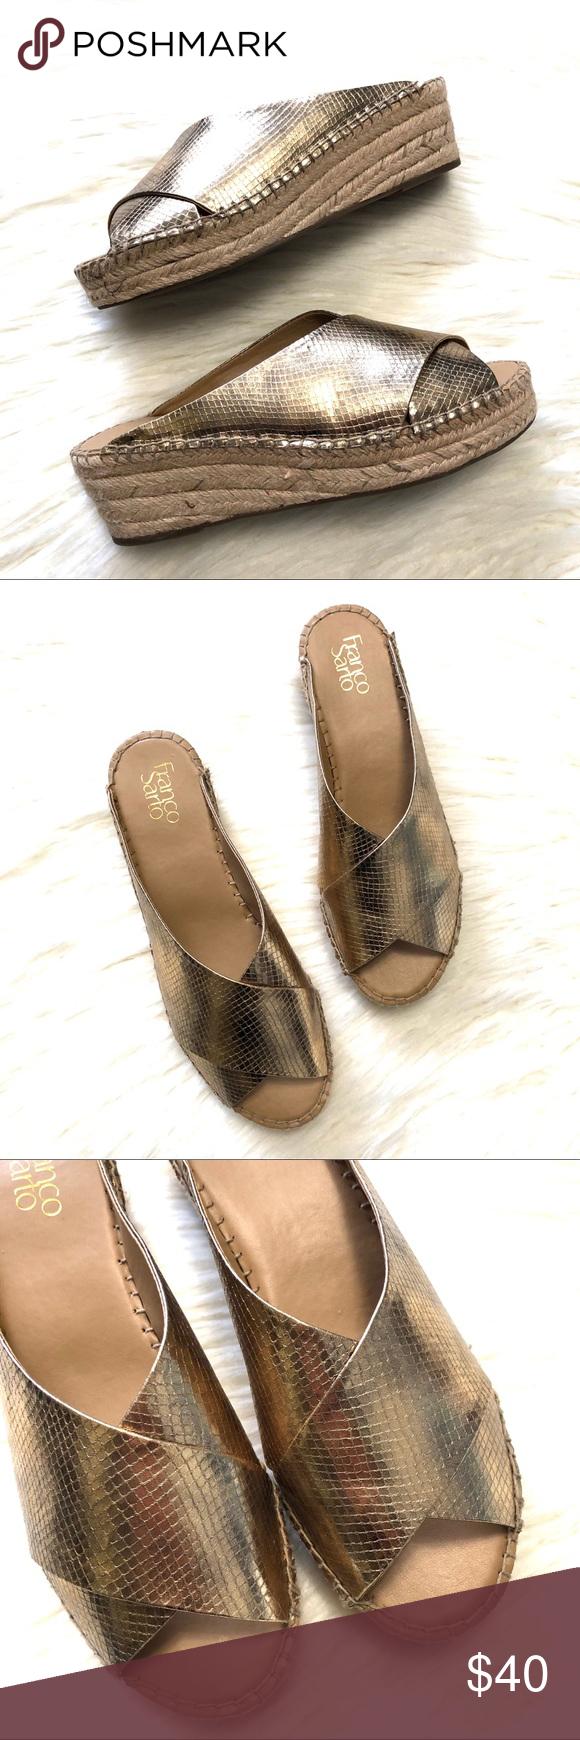 15bd84767c2 Franco Sarto Polina espadrille wedge gold sandals Franco Sarto ...